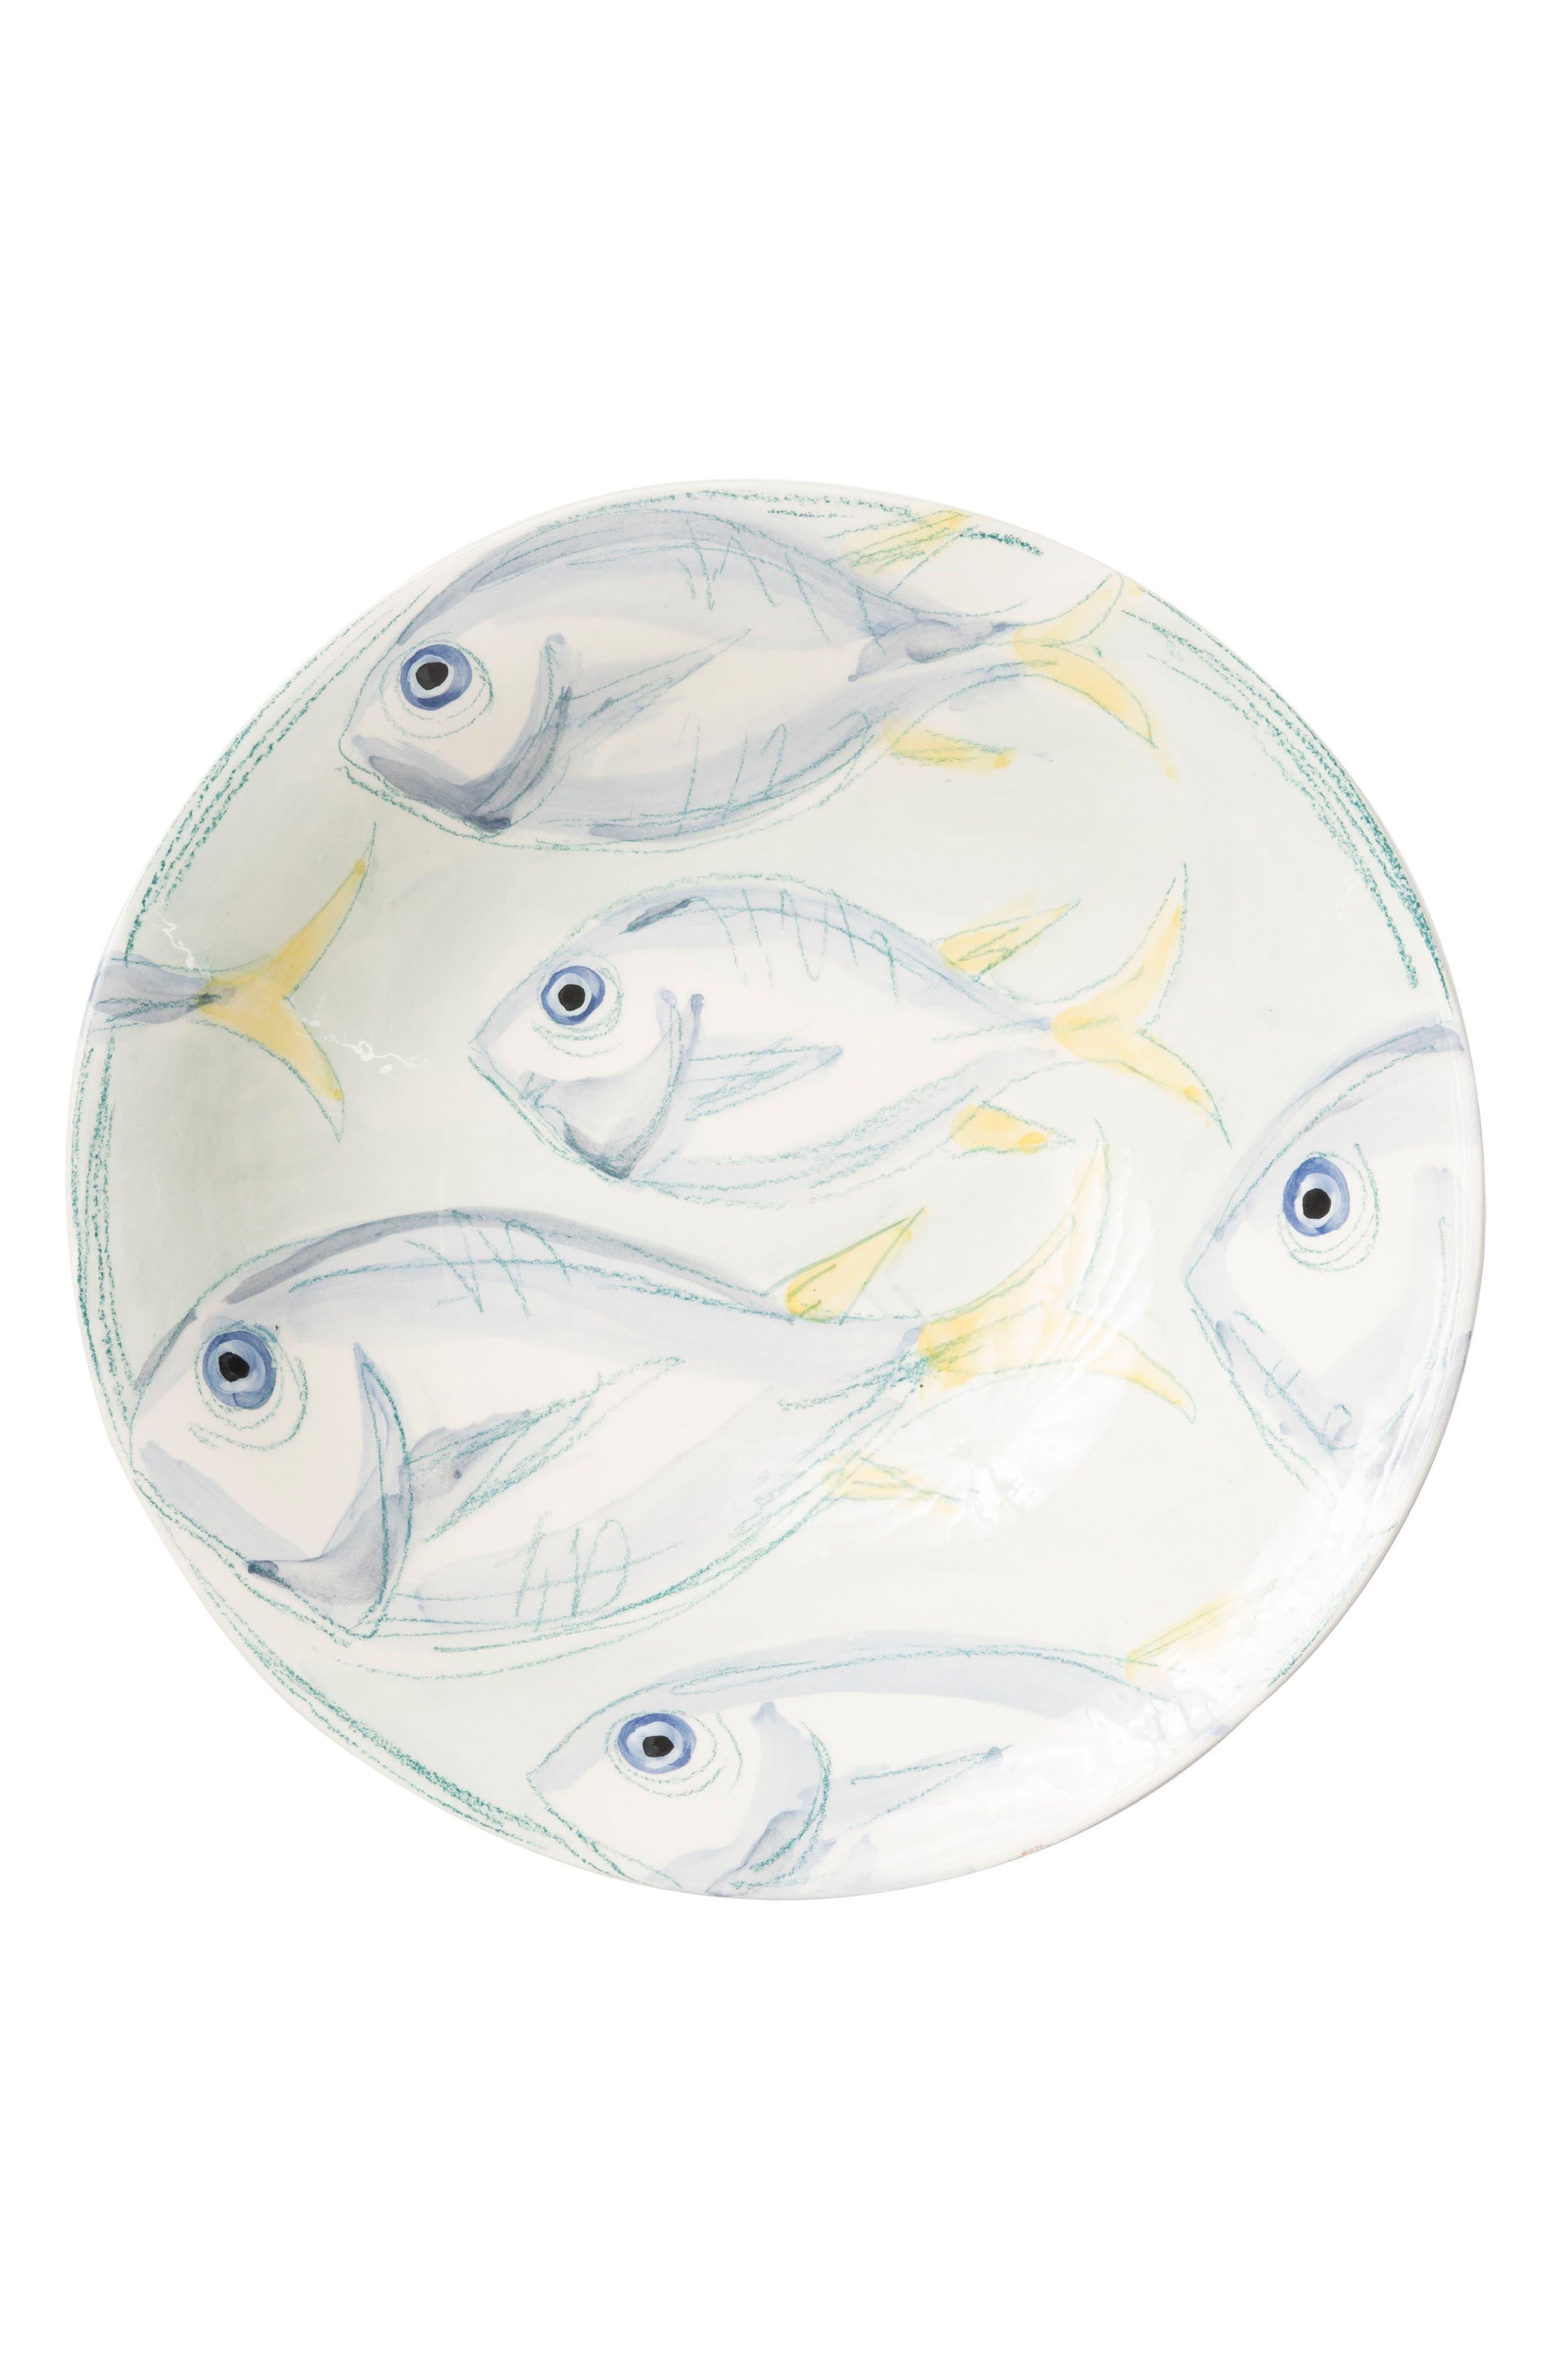 VIETRI Pescatore Large Serving Bowl